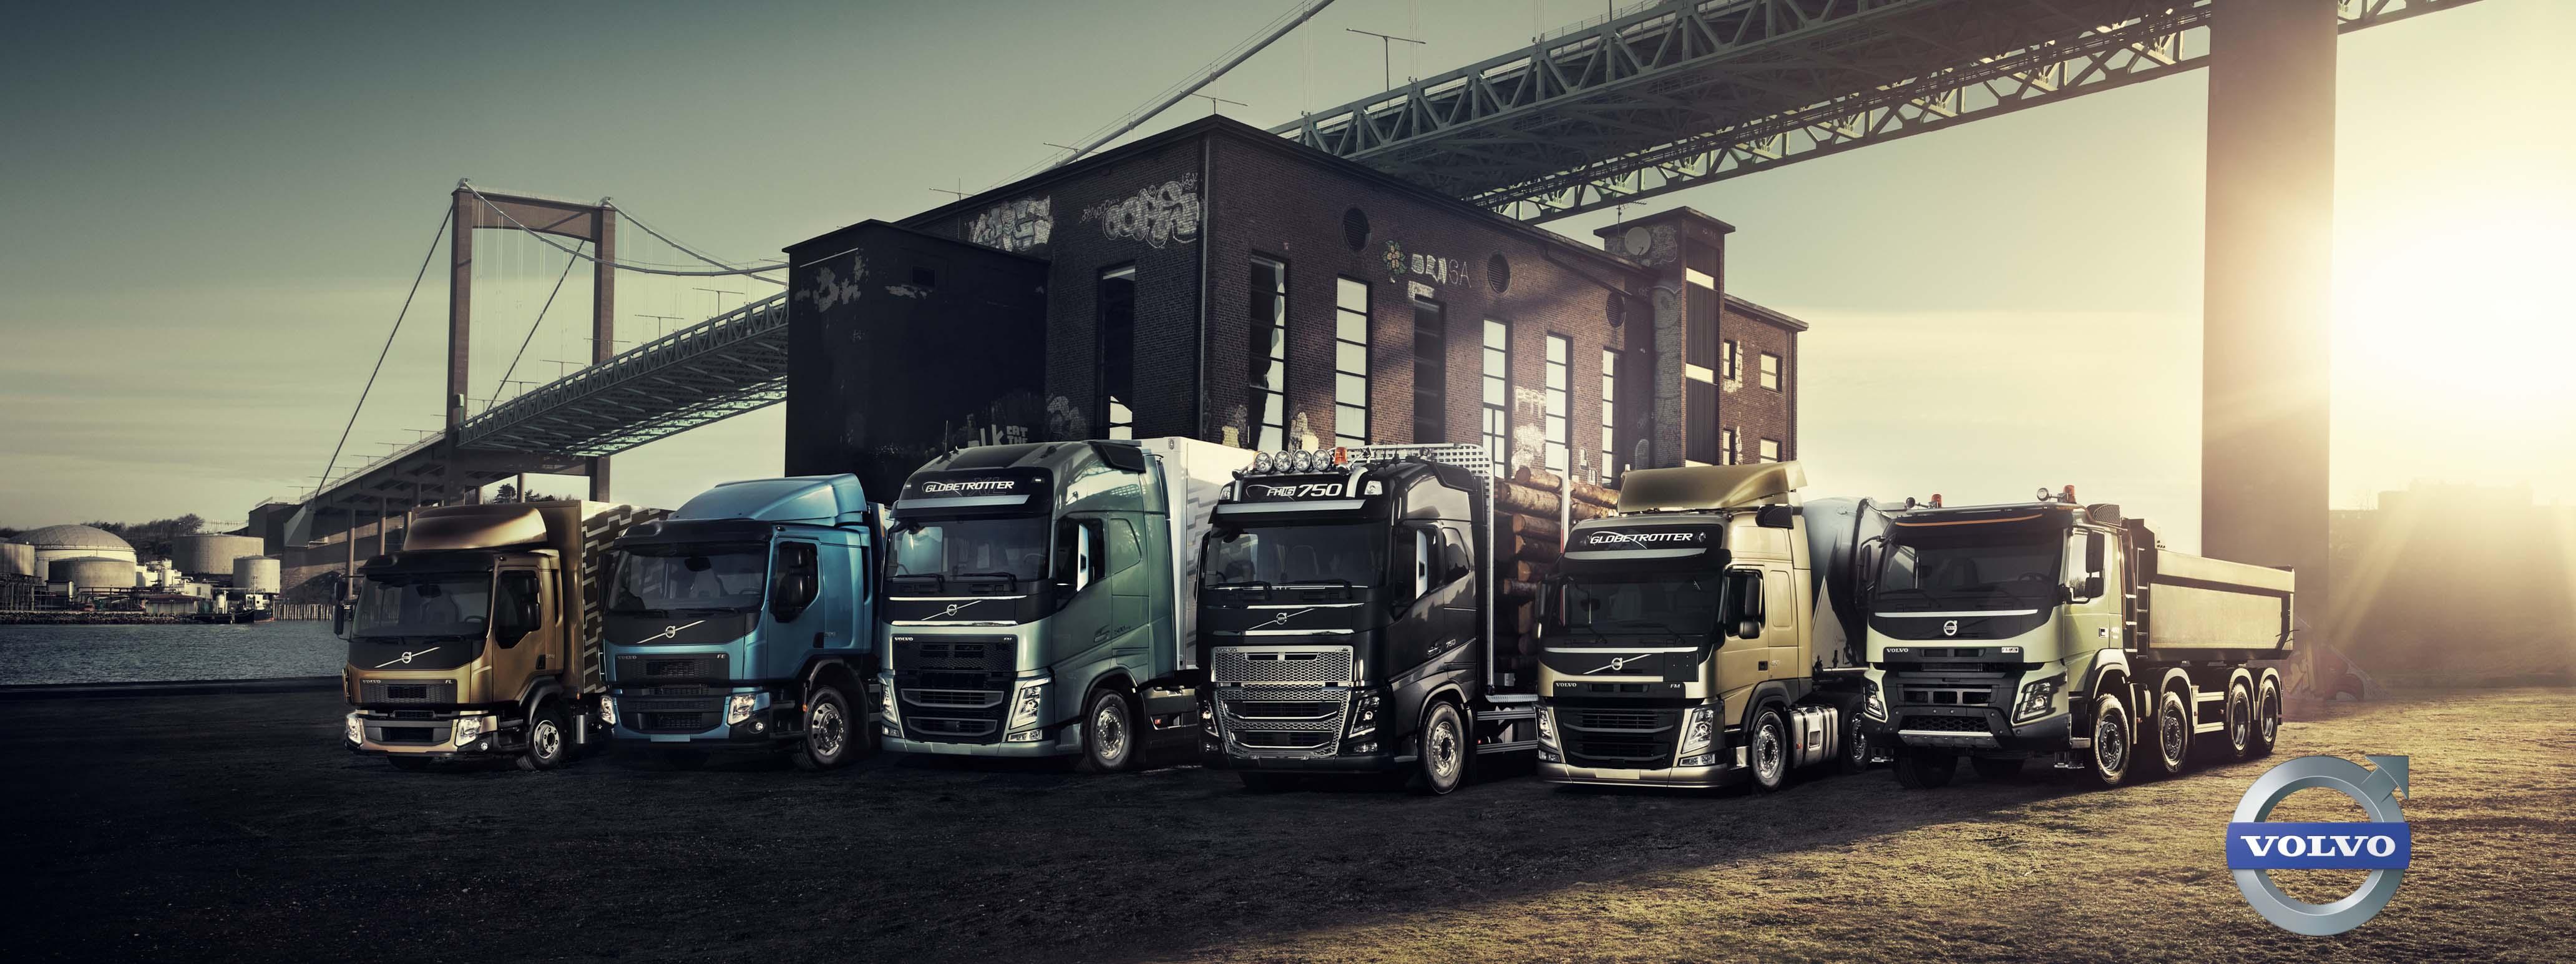 Volvo Truck Range   2018 Volvo Reviews